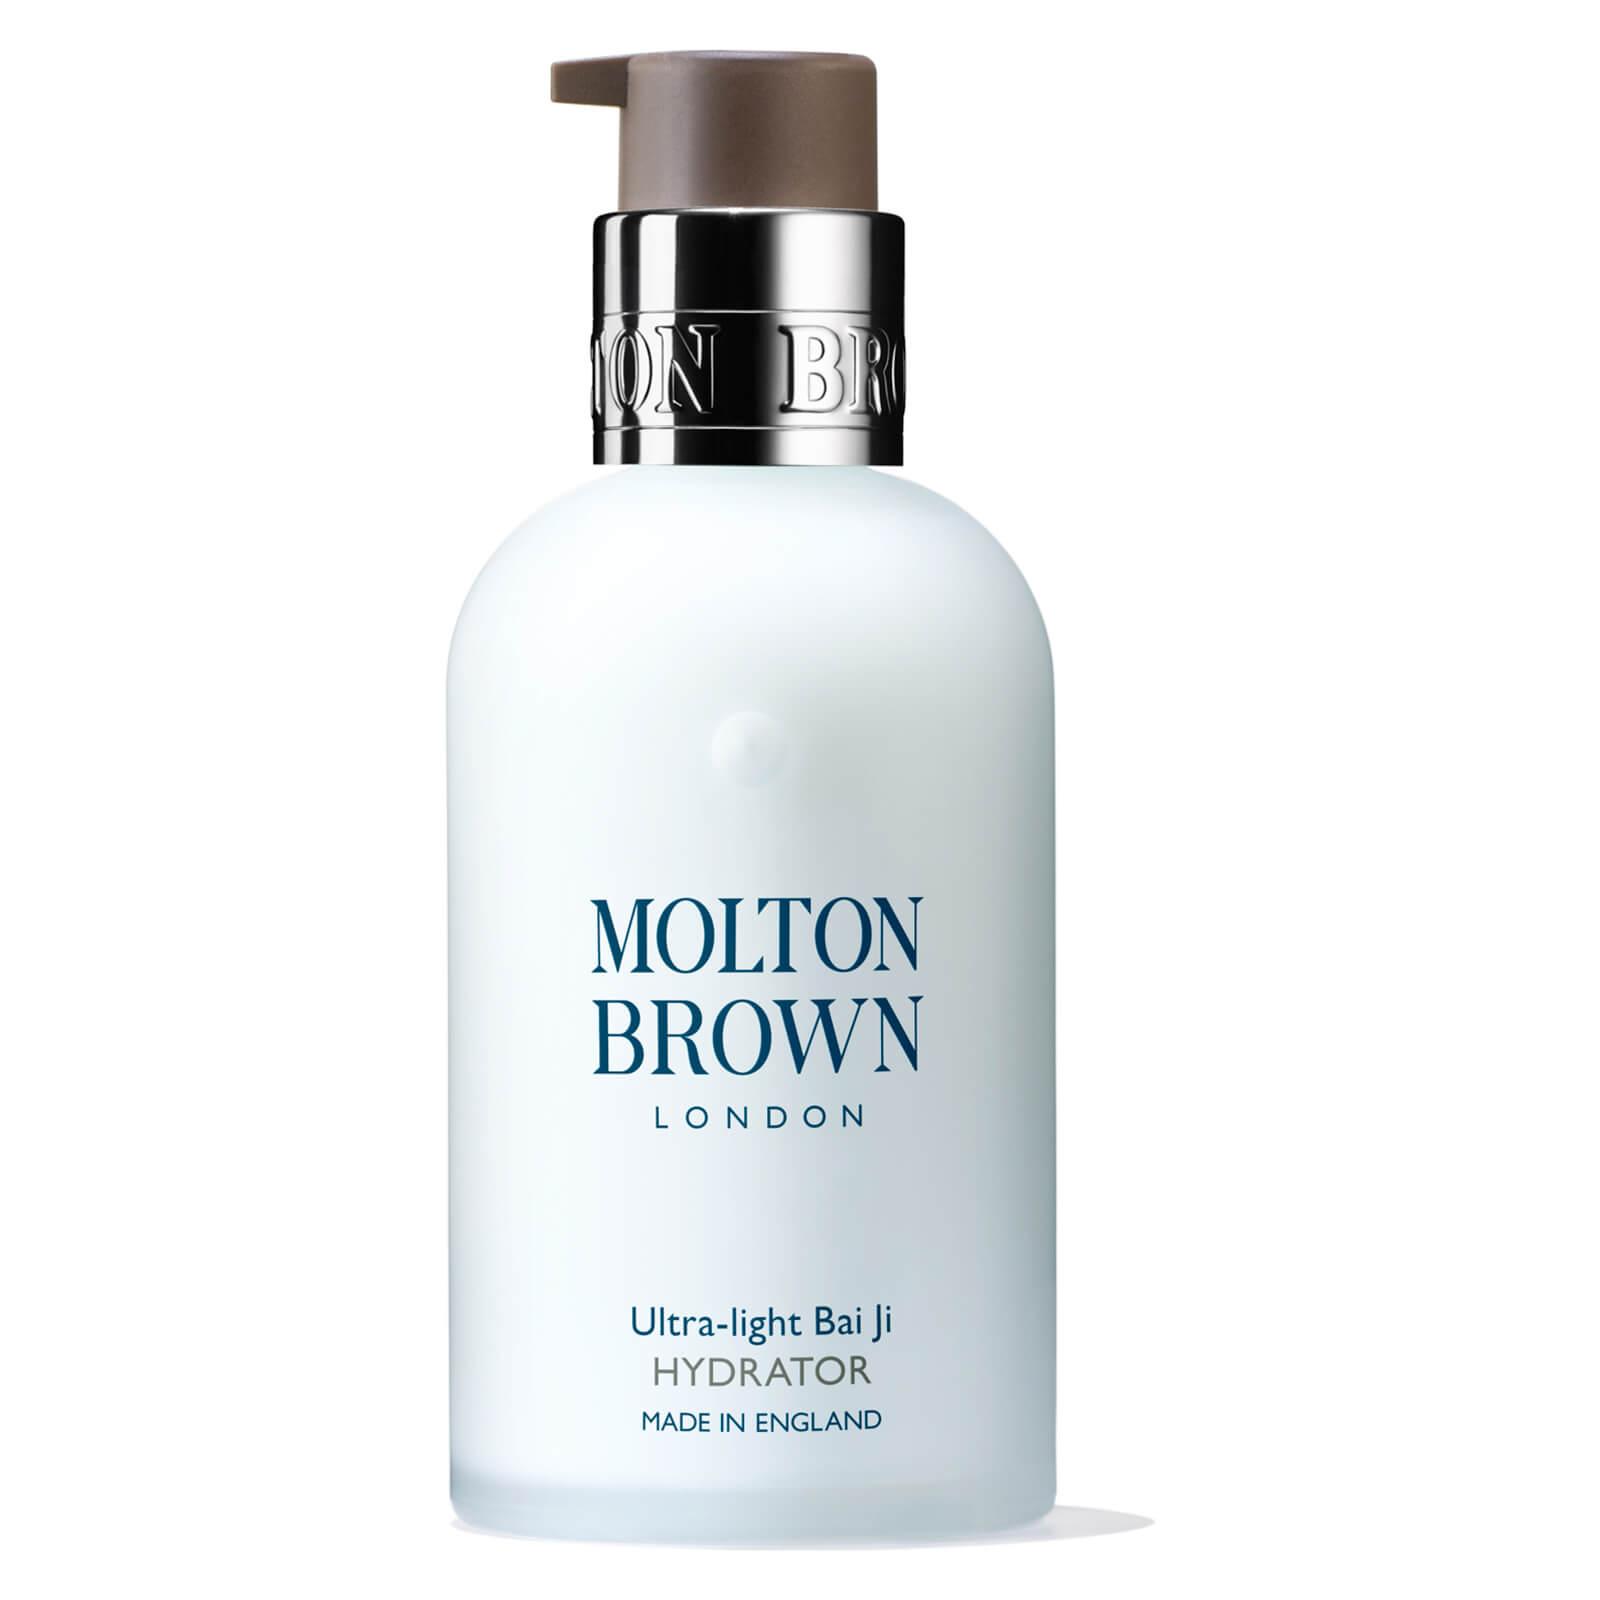 Molton Brown Ultra Light Bai Ji crème-gel hydratante